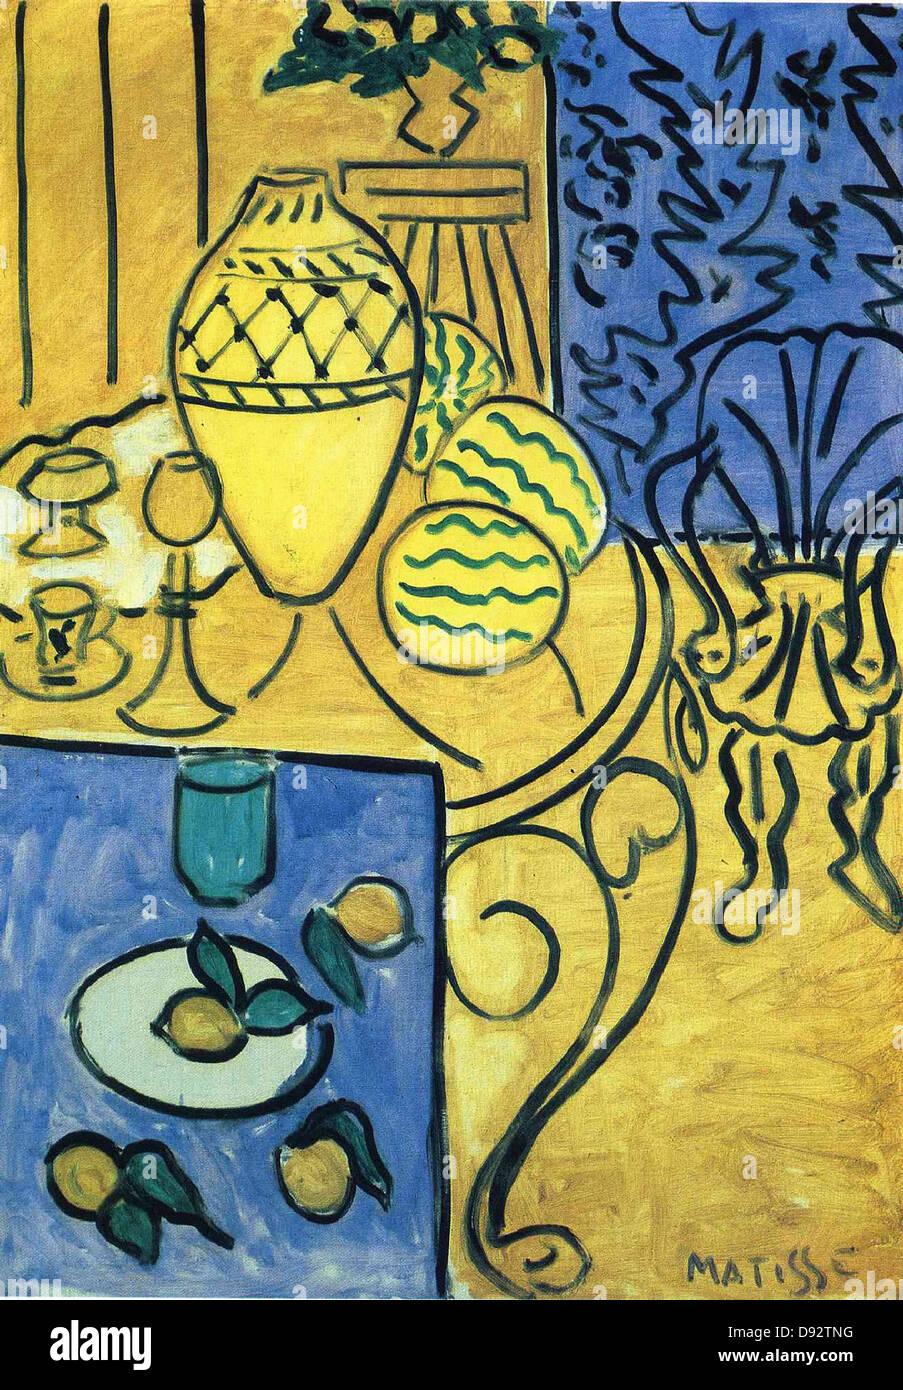 Henri Matisse interieur jaune en 1946 el Centro Georges Pompidou - Paris Foto de stock